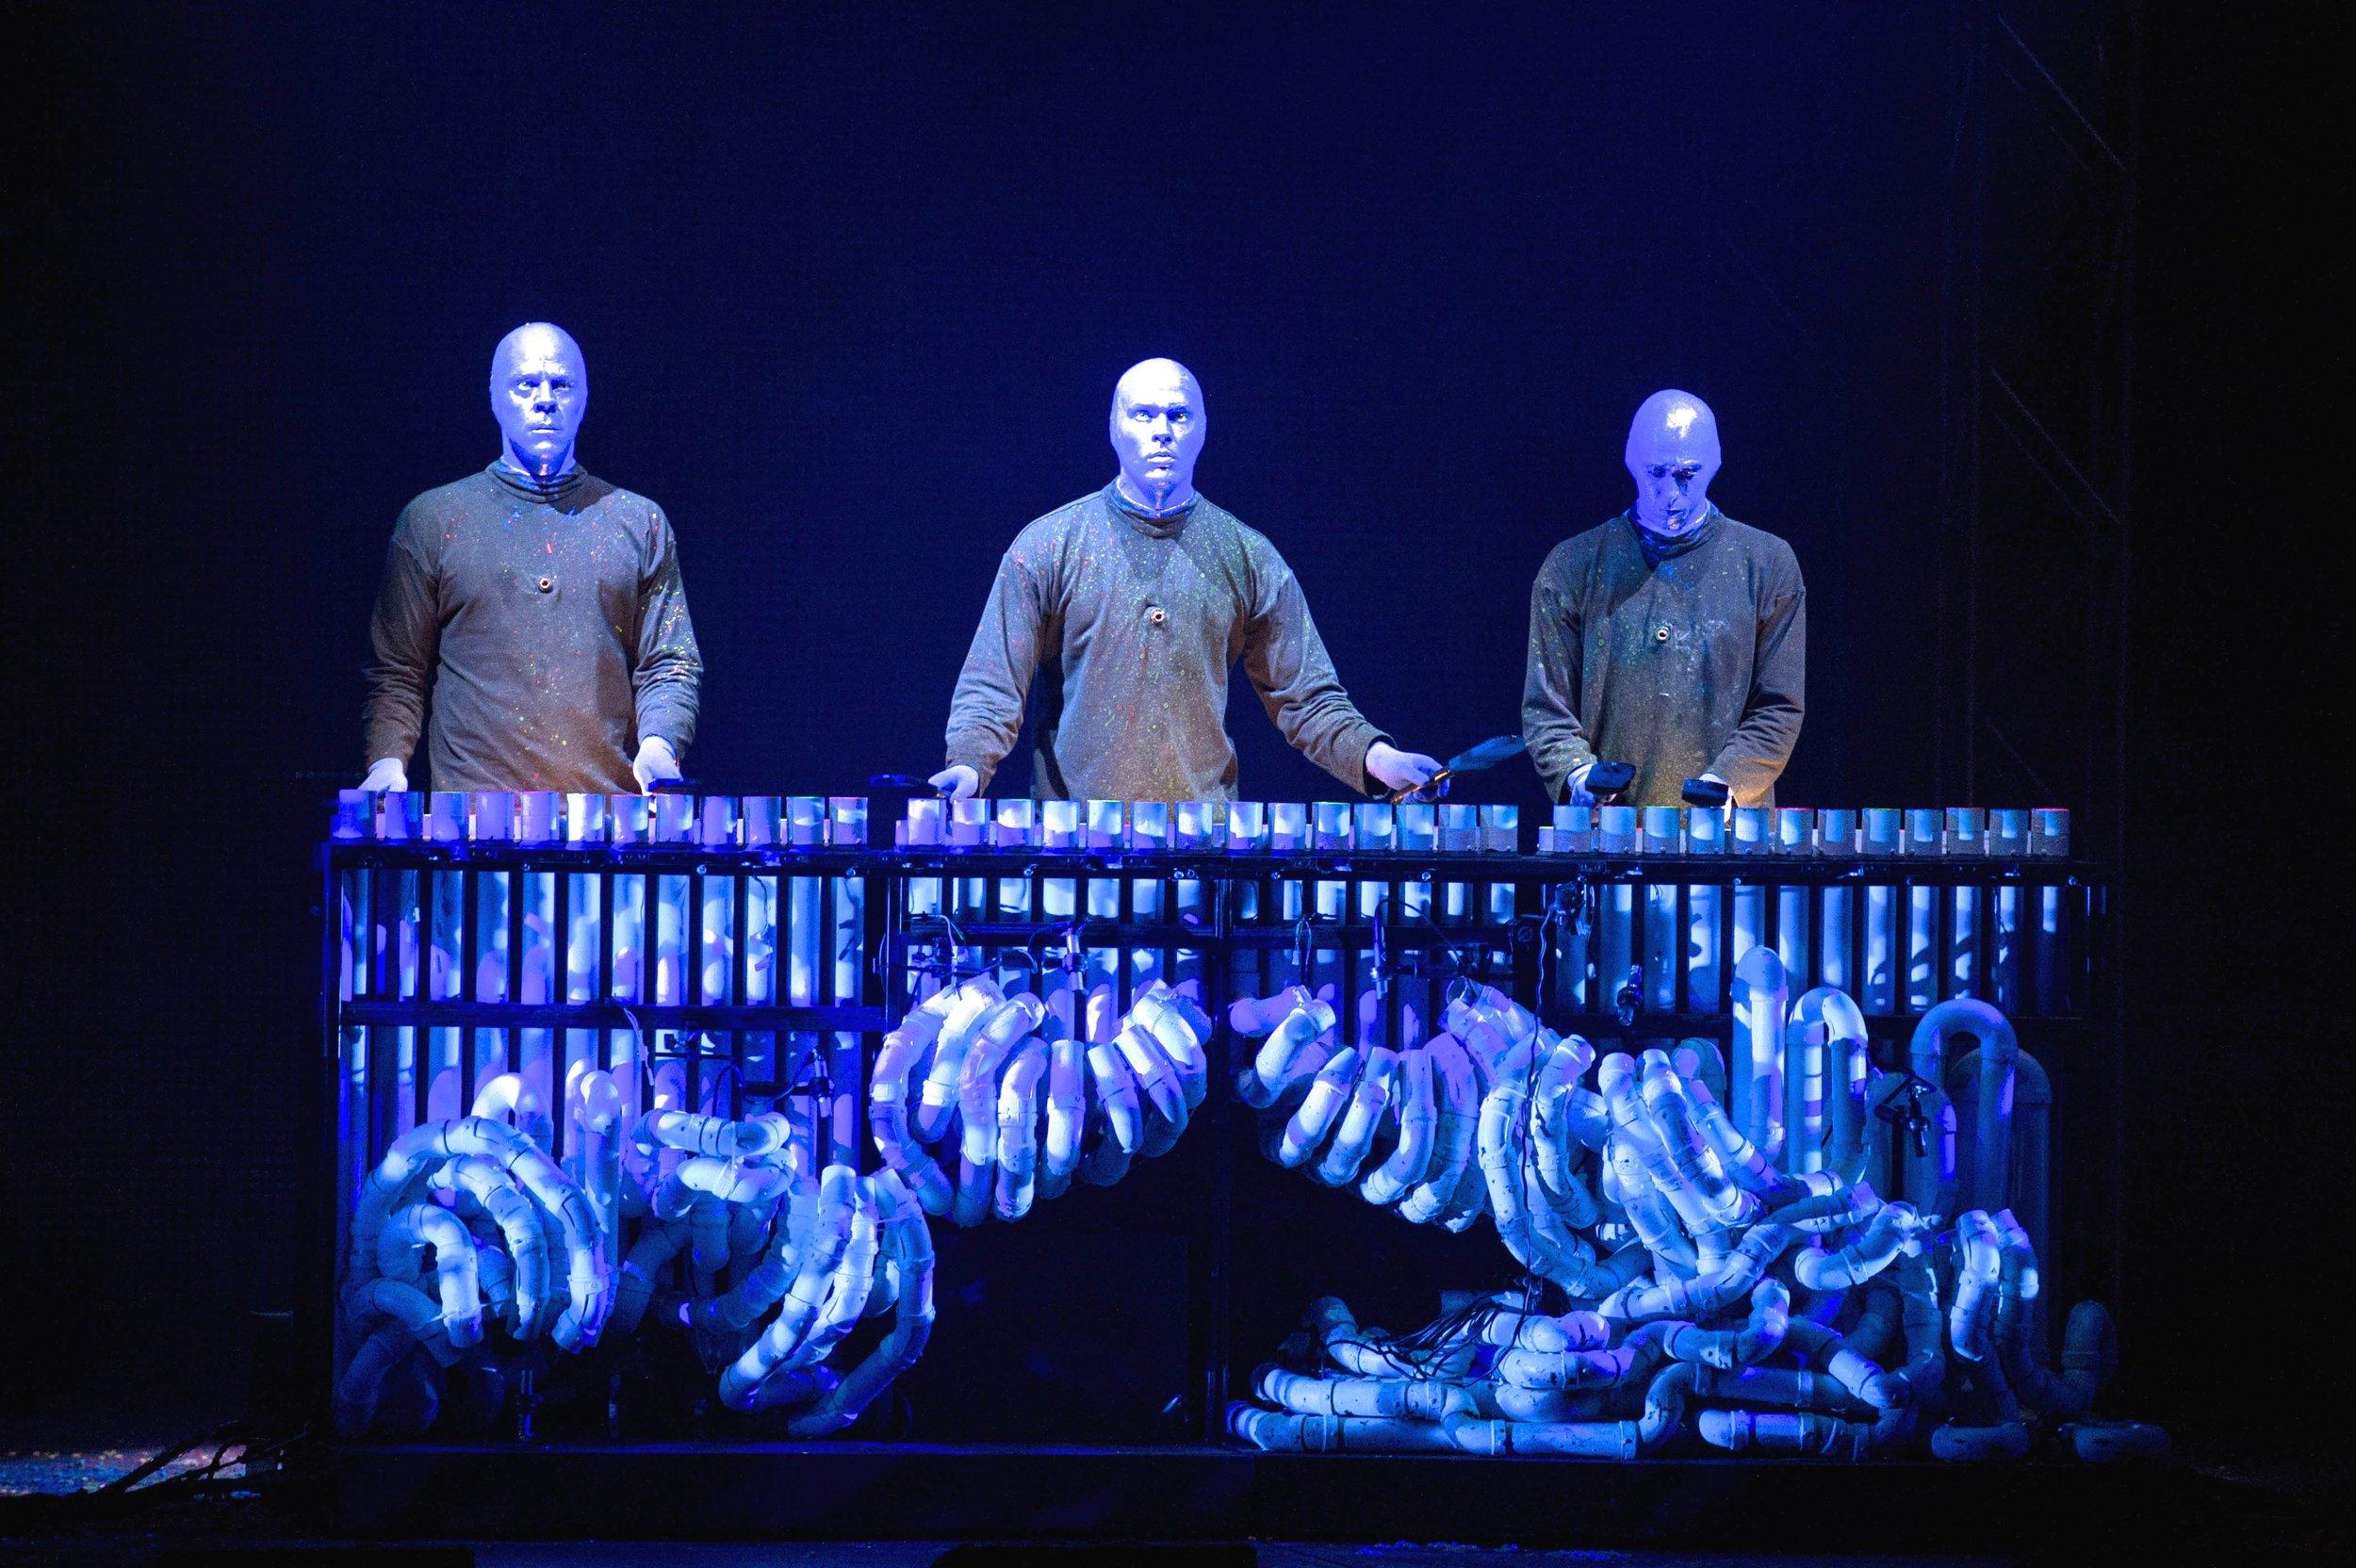 blue-man-group-washington-dc-national-theatre_rich-kessler-2-of-002.jpg